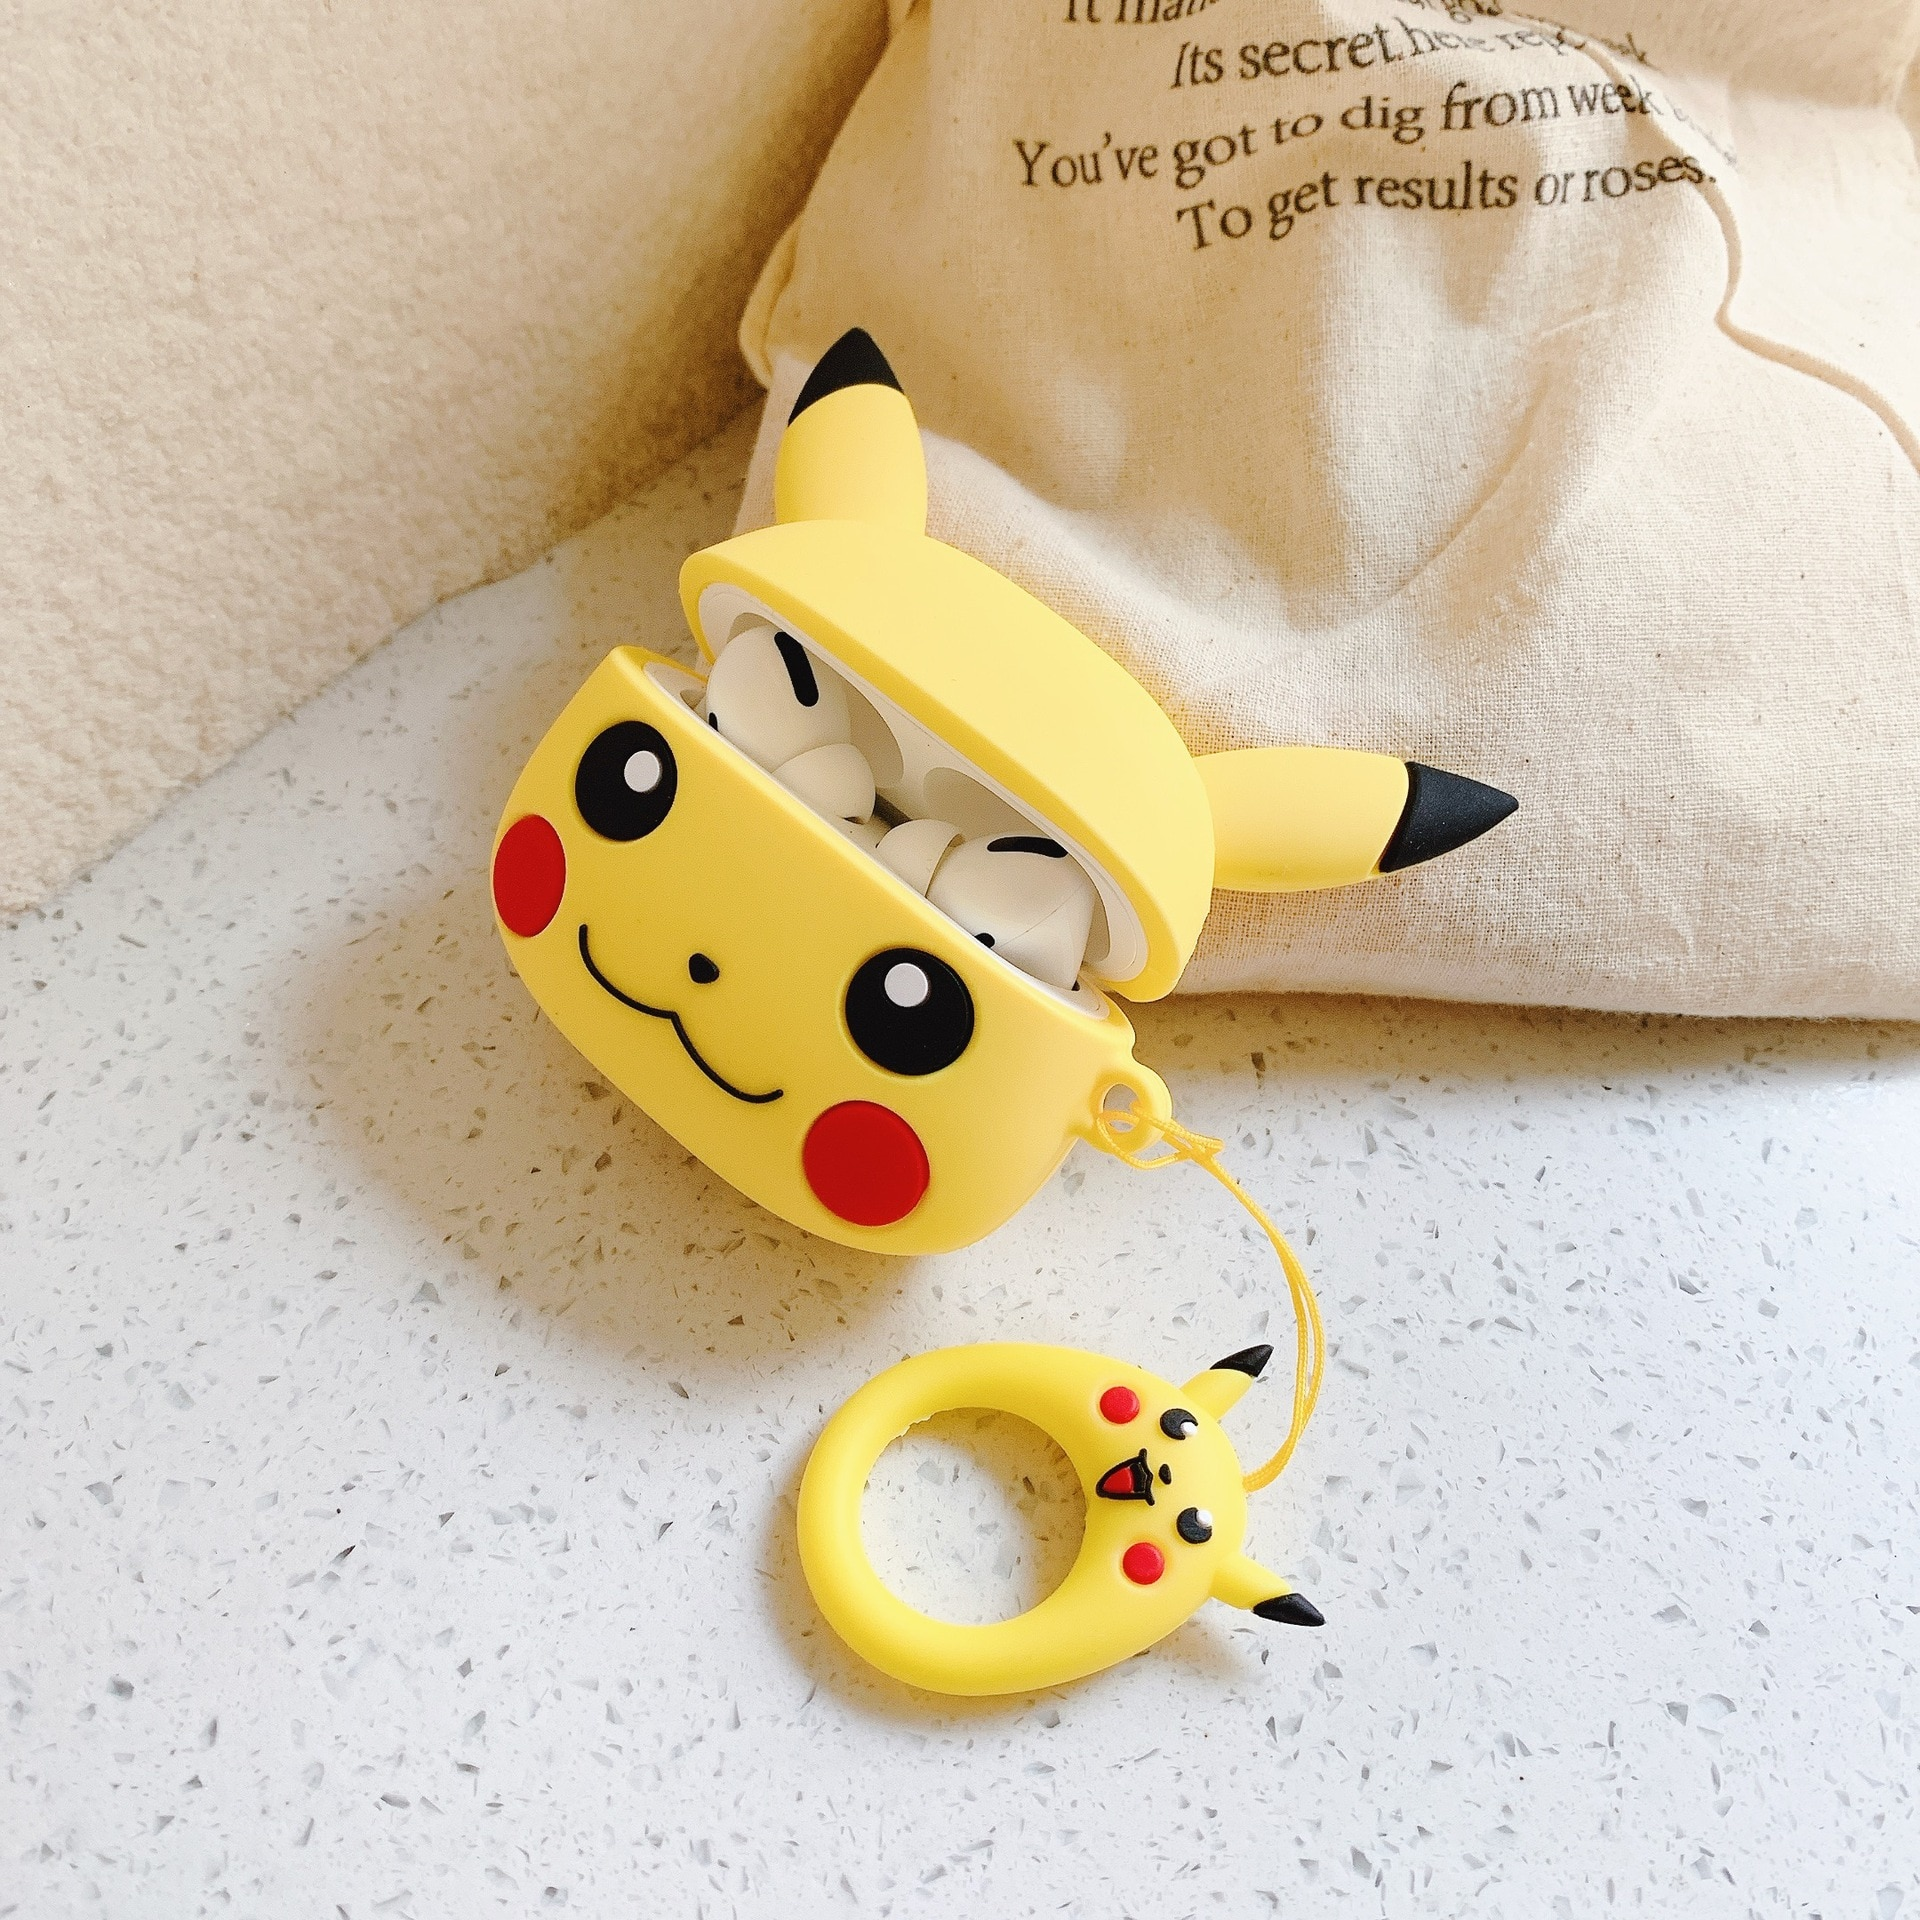 AliExpress - Pokemon AirPods Pro 3 Silicone Case Kawaii Pikachu Cartoon Anti-fall Bluetooth Headset Protective Case Box New Year Gift